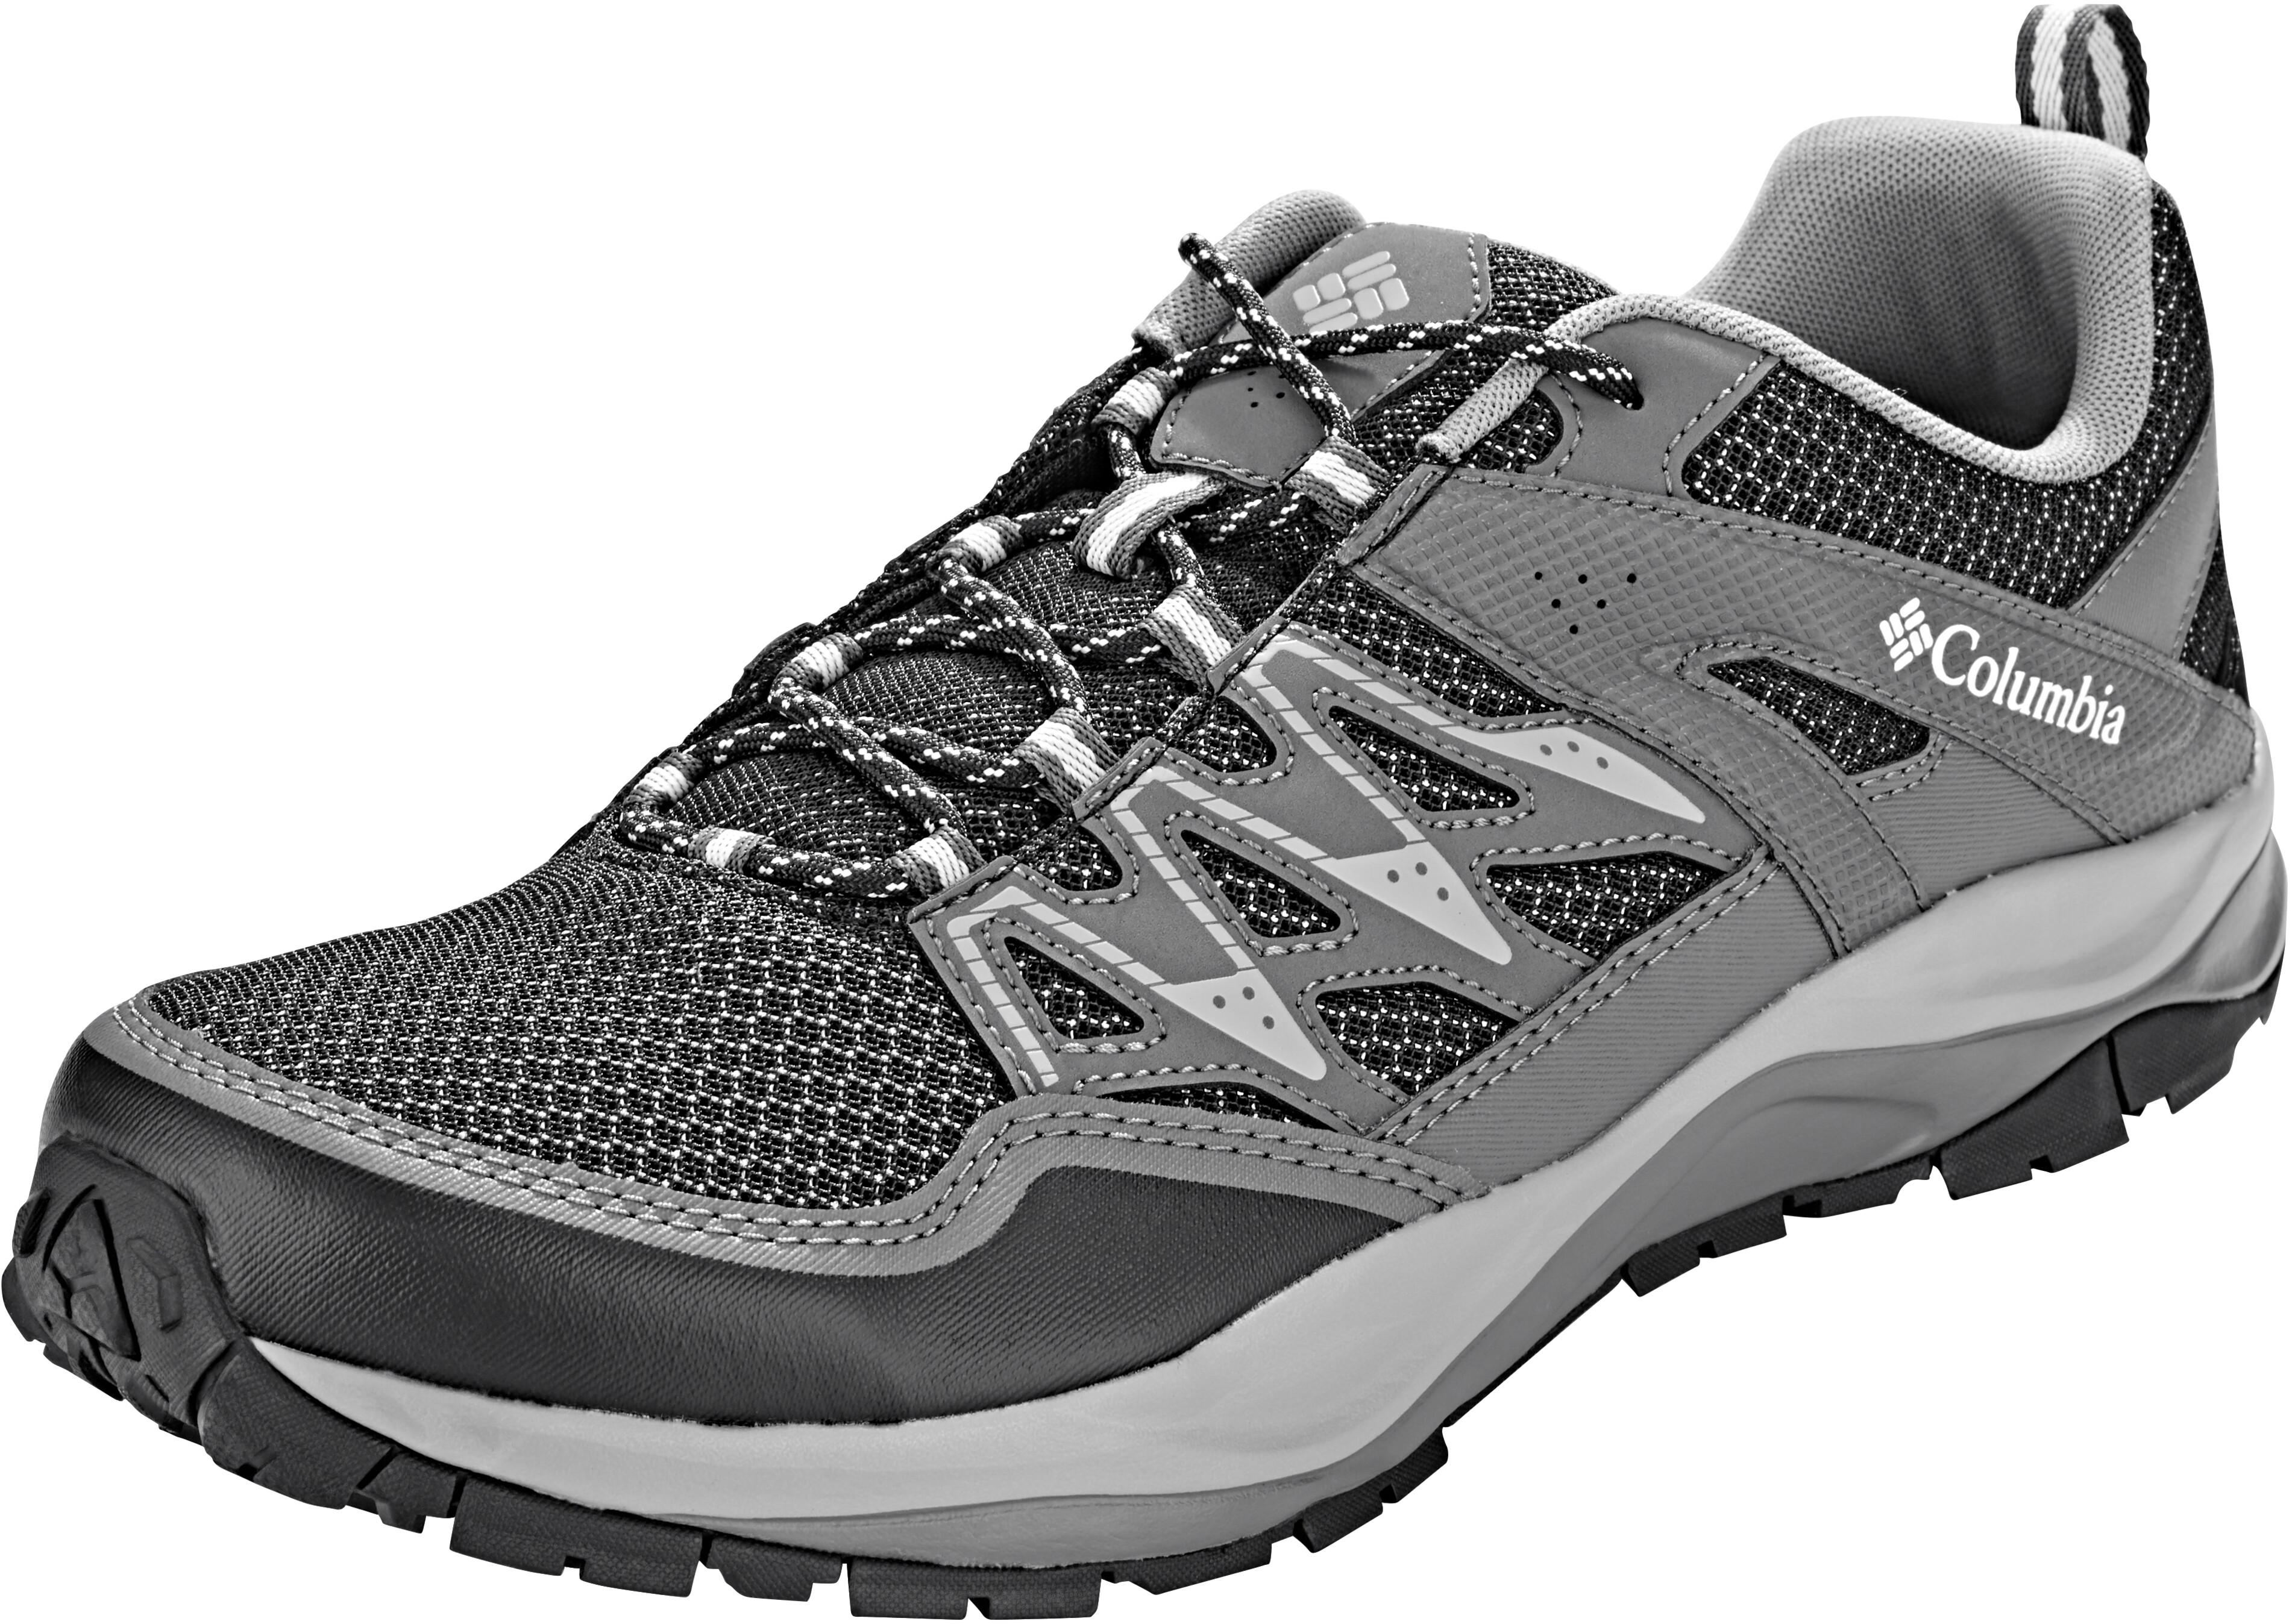 a678dafde6f Columbia Wayfinder Shoes Men